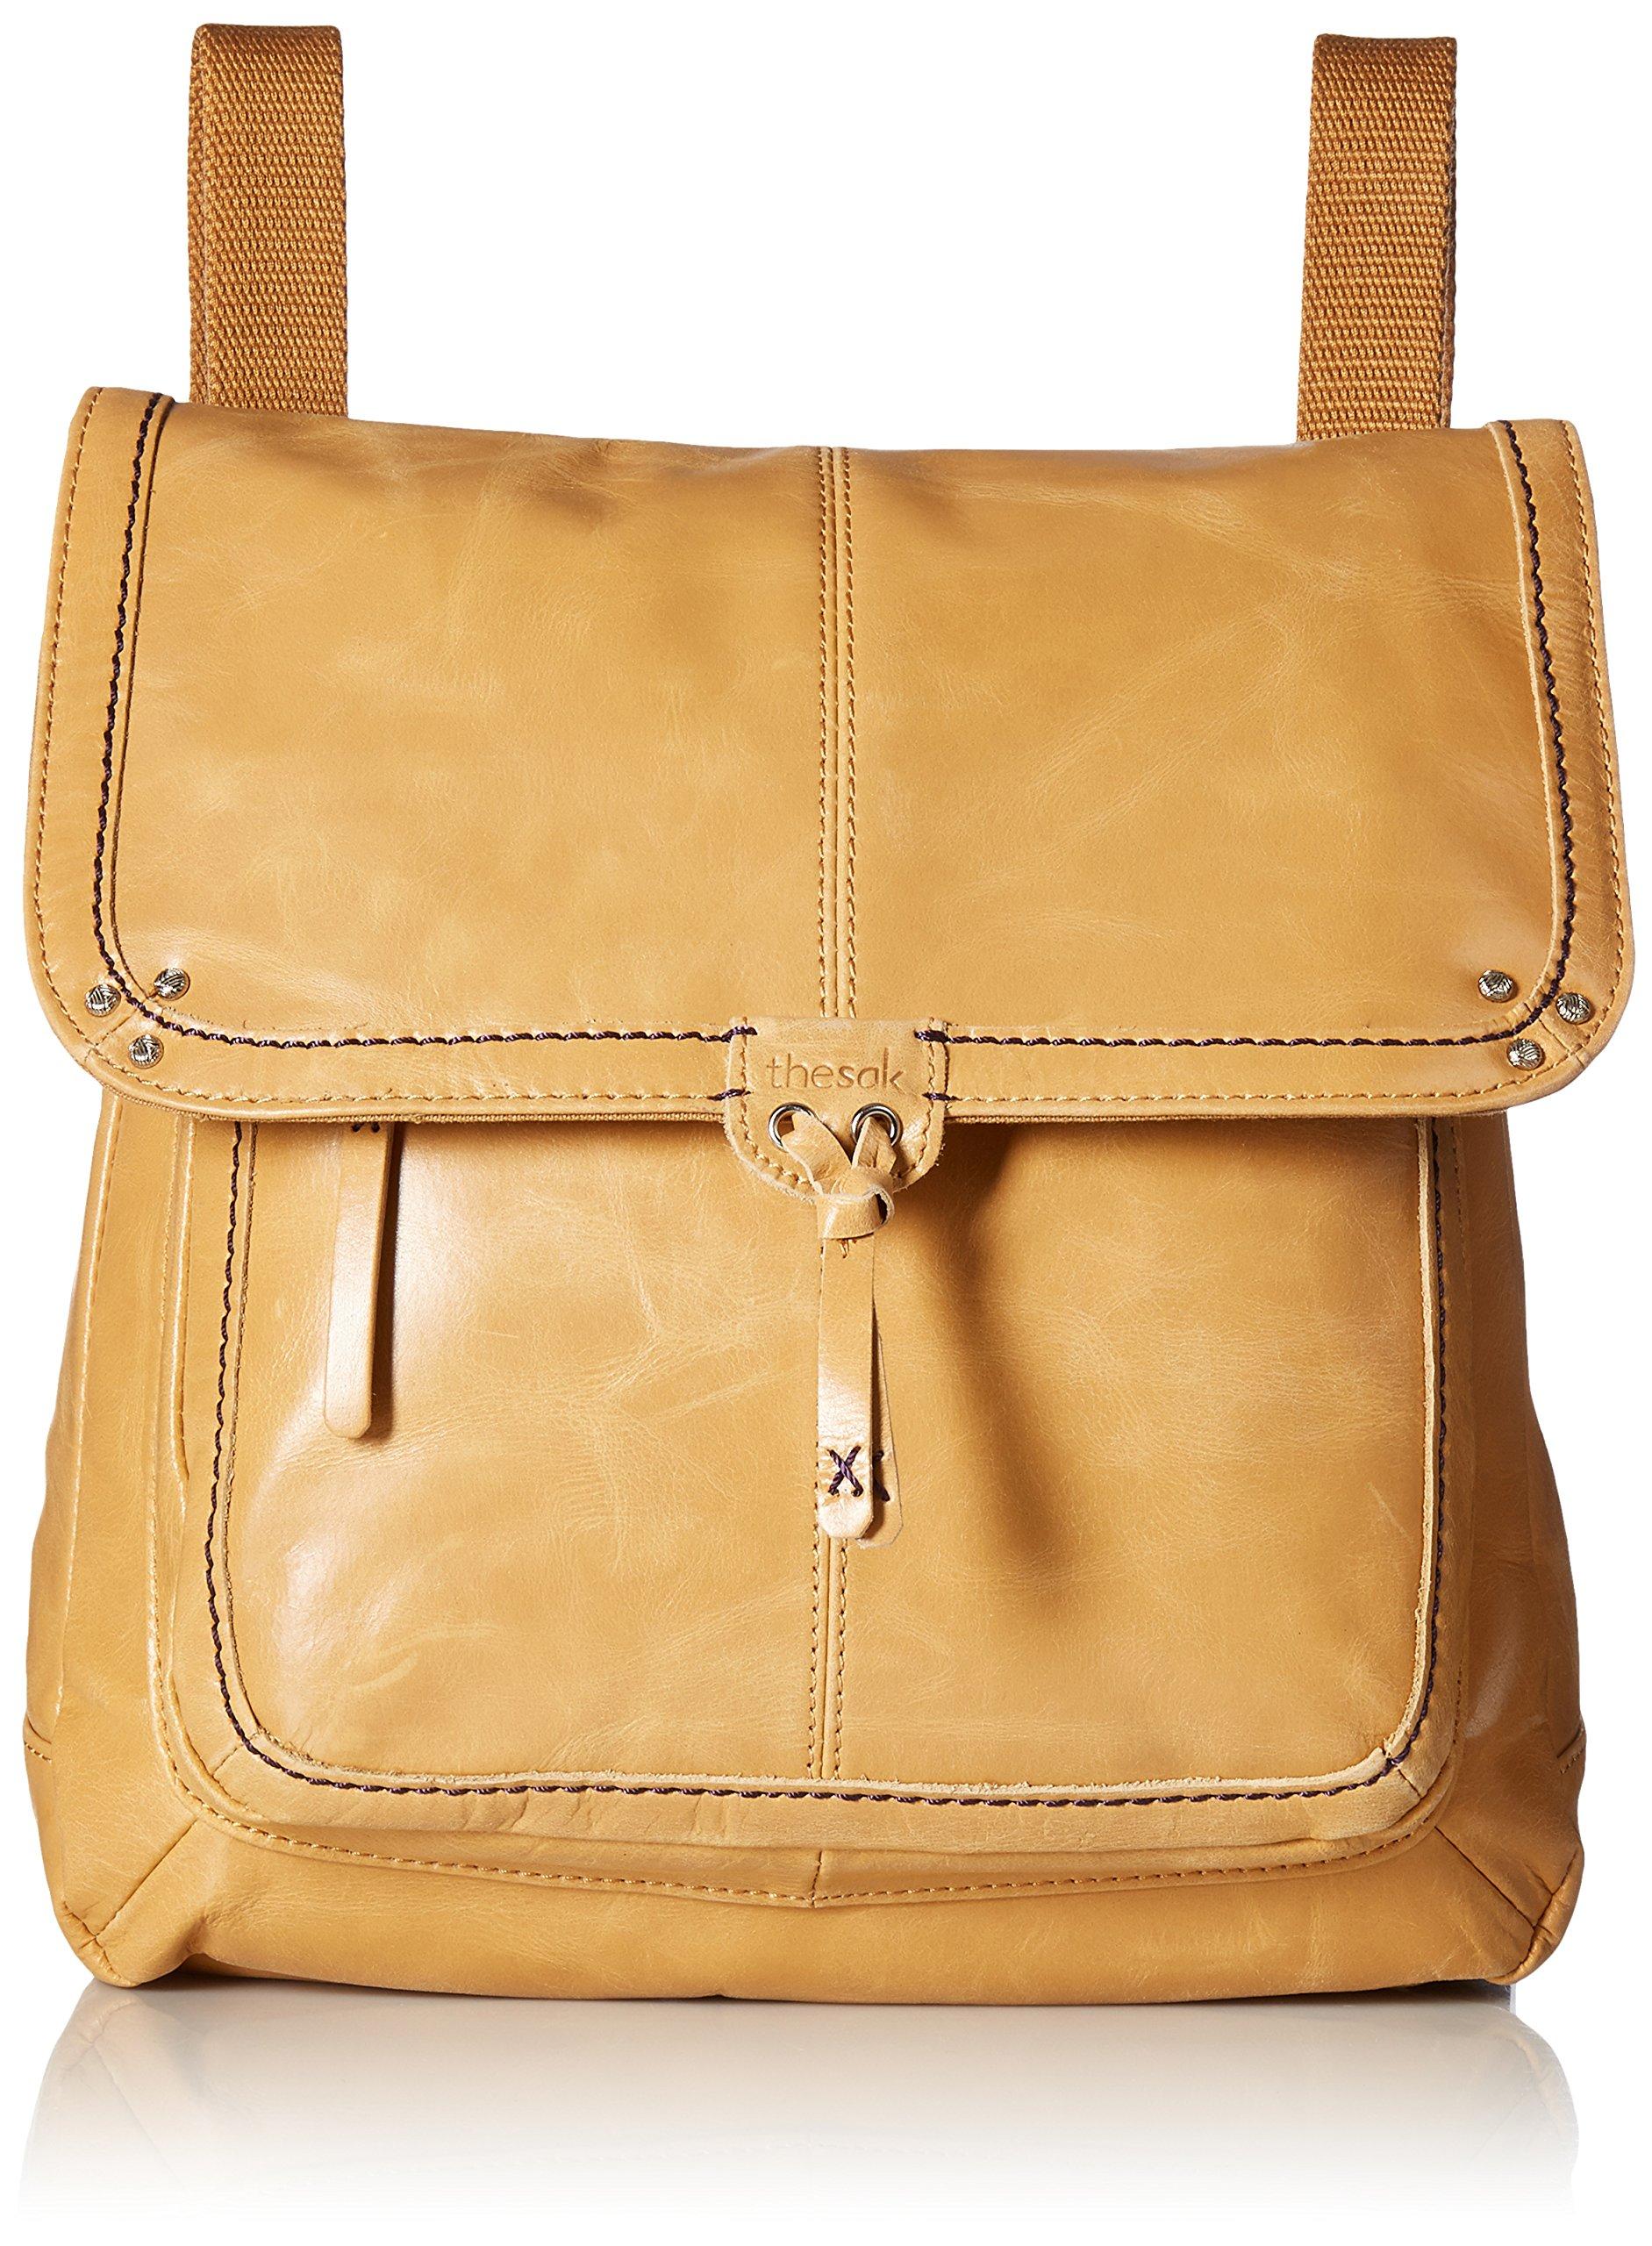 The SAK Ventura Fashion Backpack, Camel, One Size